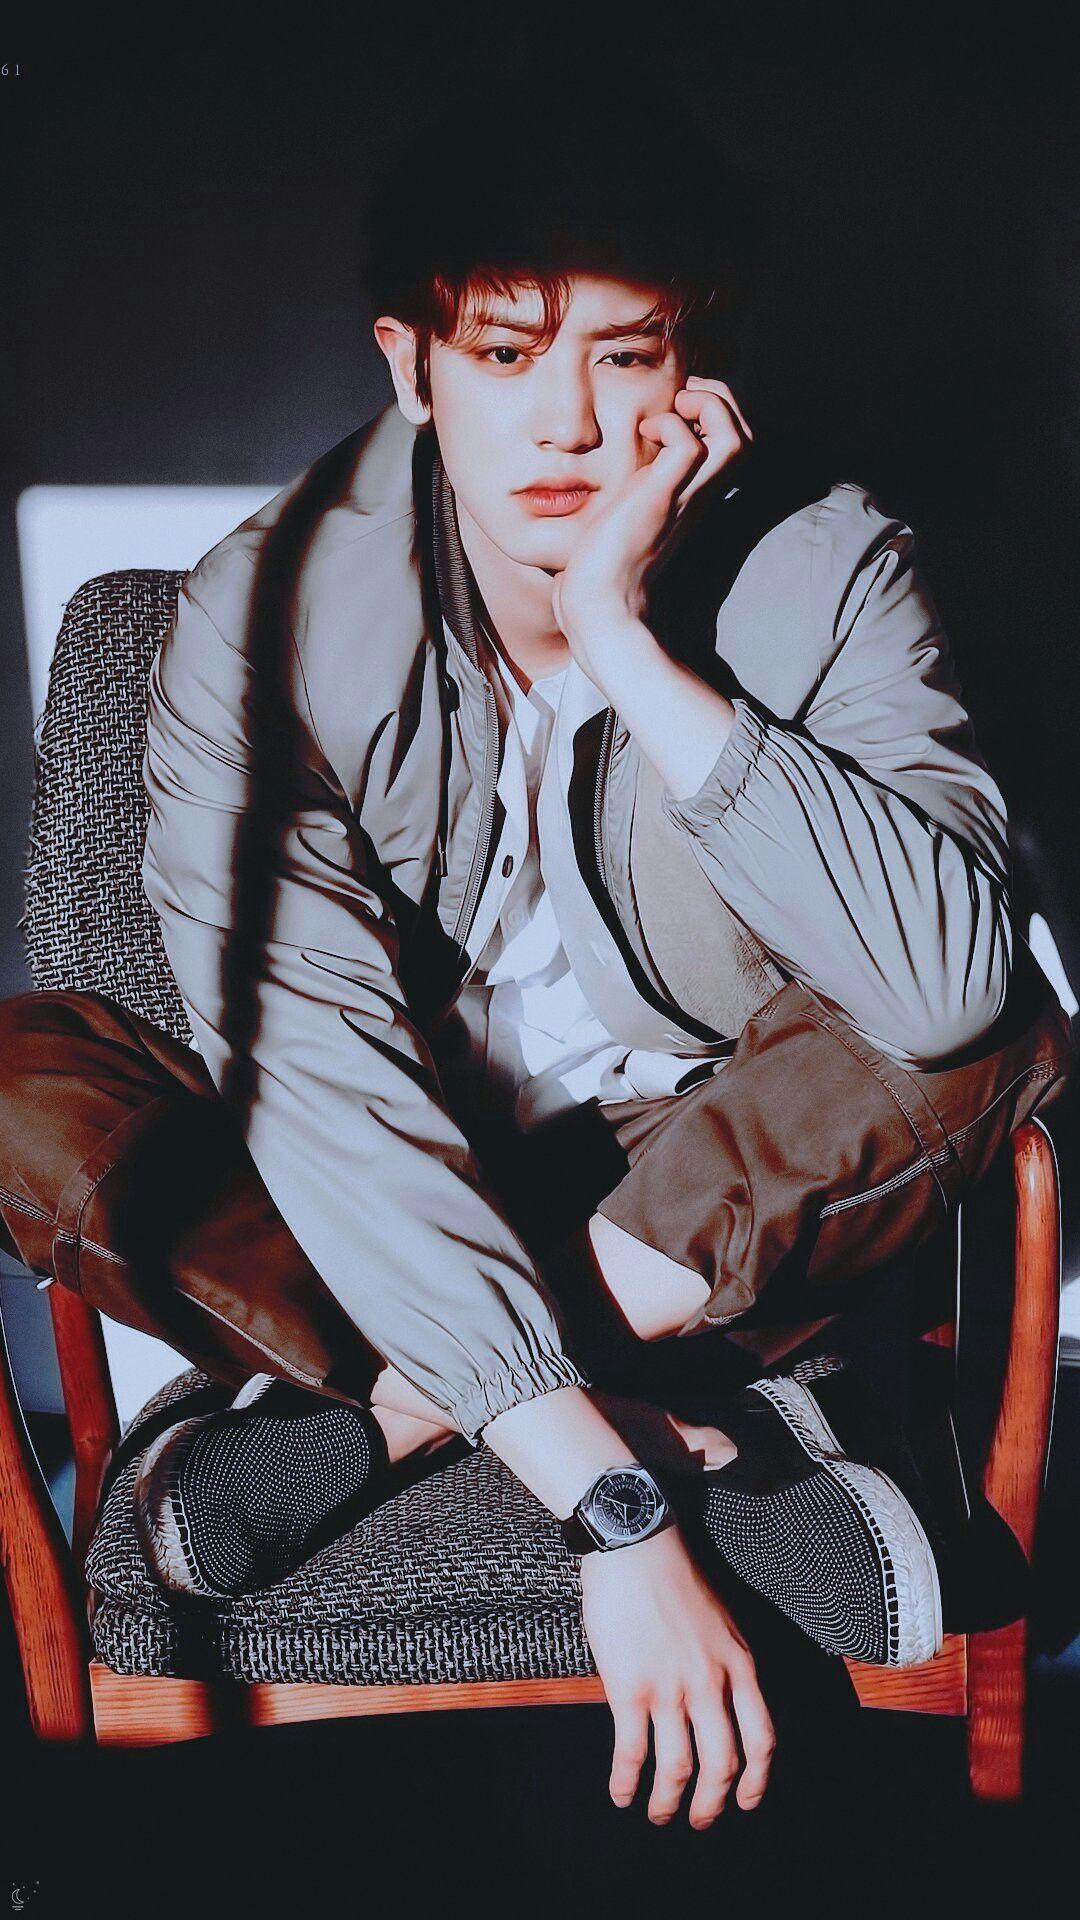 prince exo wallpaper - photo #38